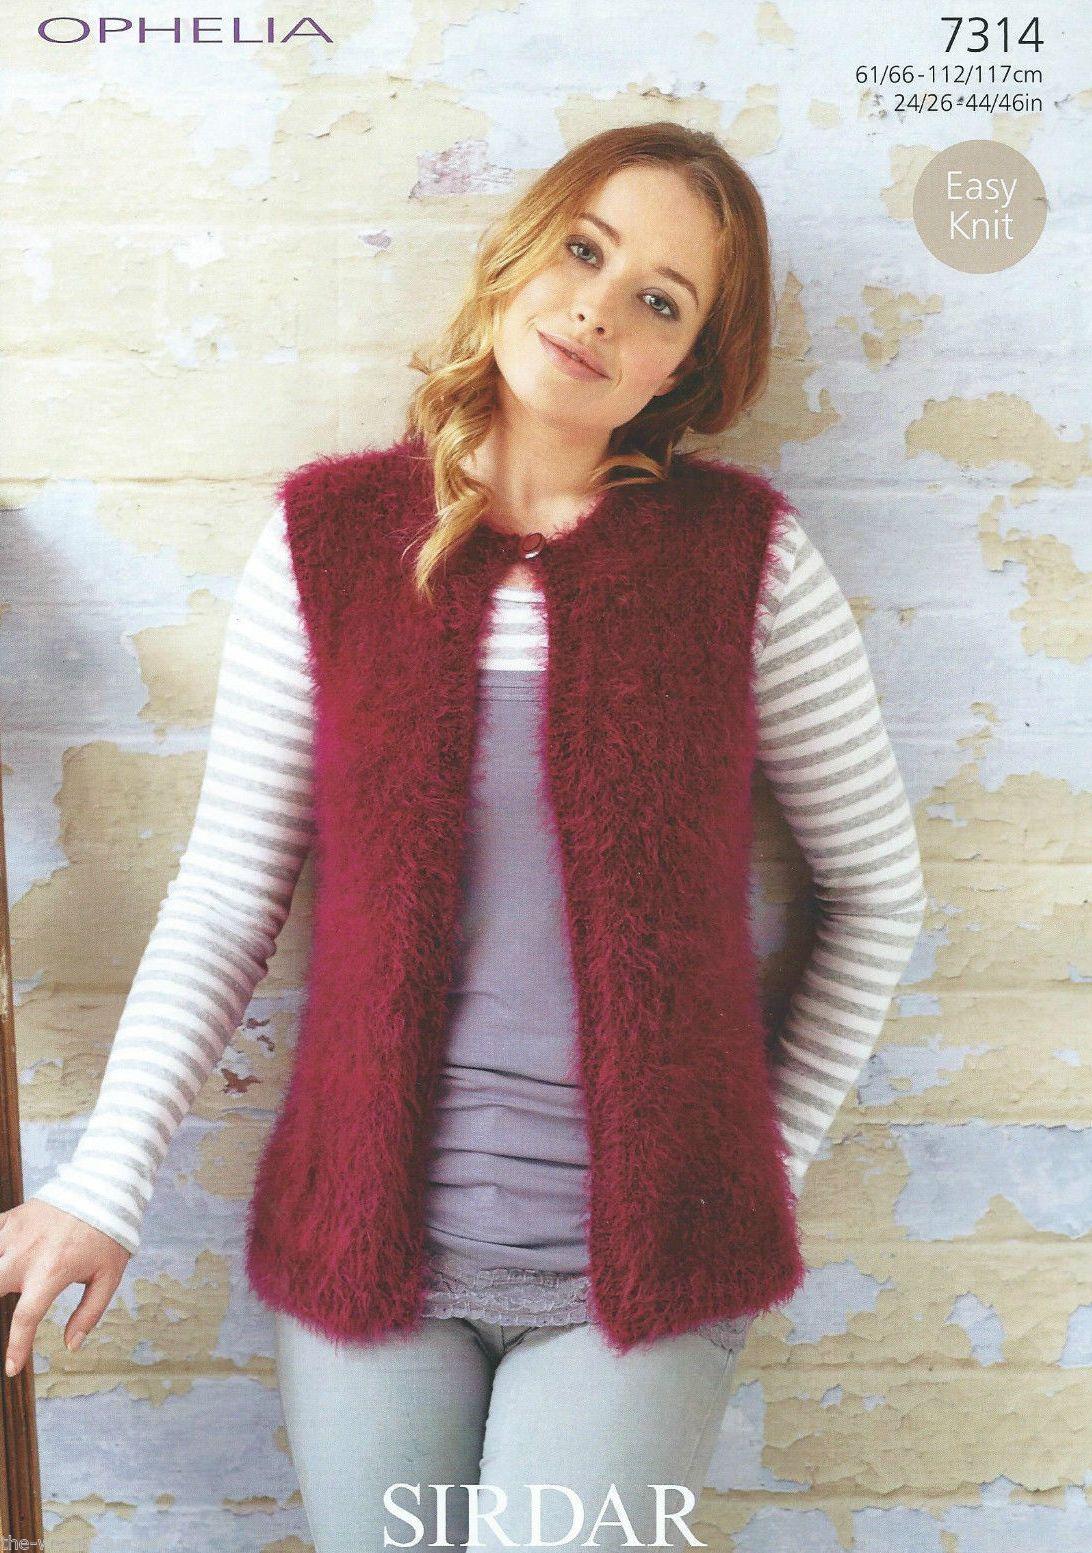 7314 Sirdar Ophelia Chunky Easy Knit Gilet Knitting Pattern To